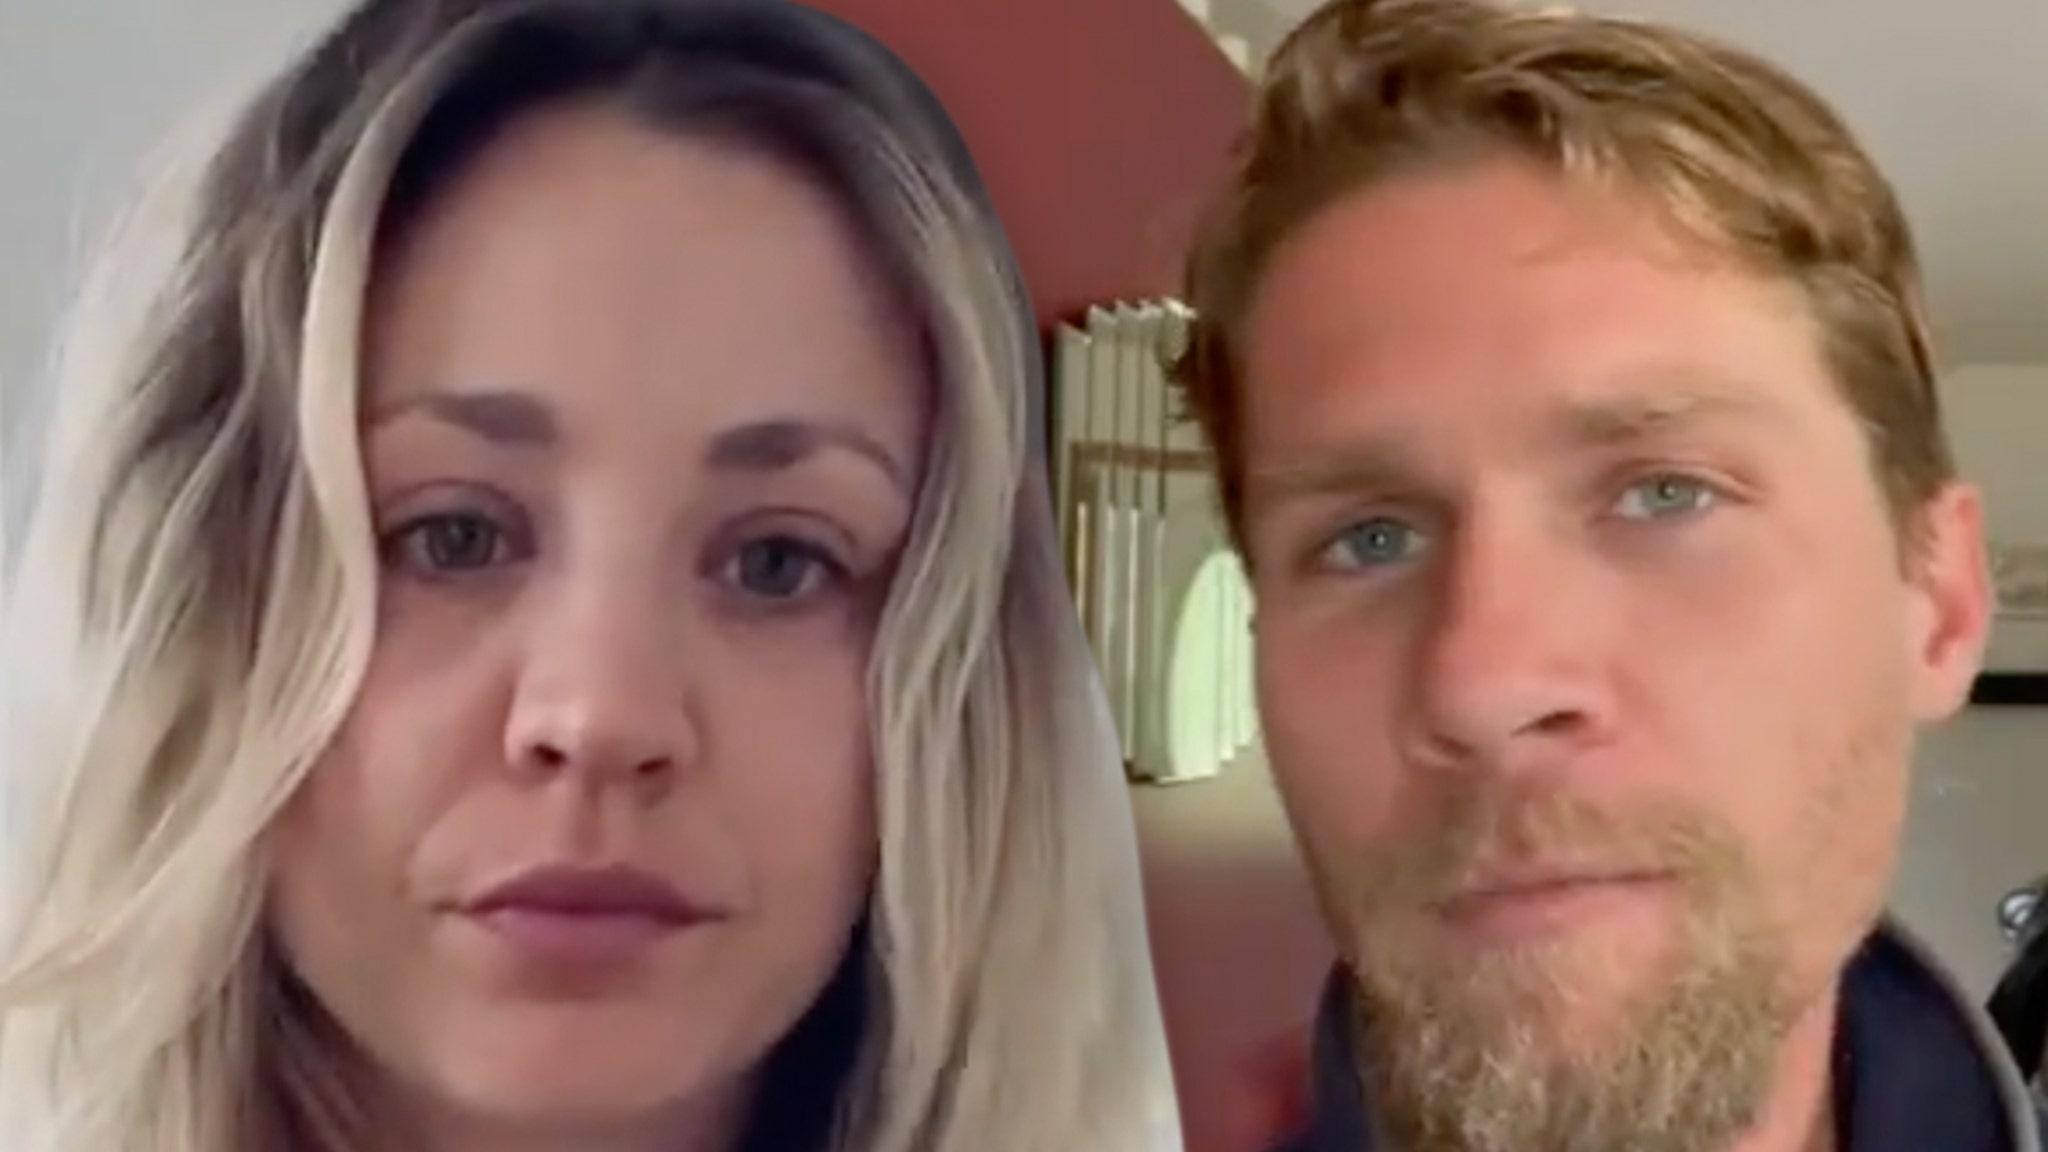 Kaley Cuoco Comments Hearts on Estranged Husband's Photo thumbnail